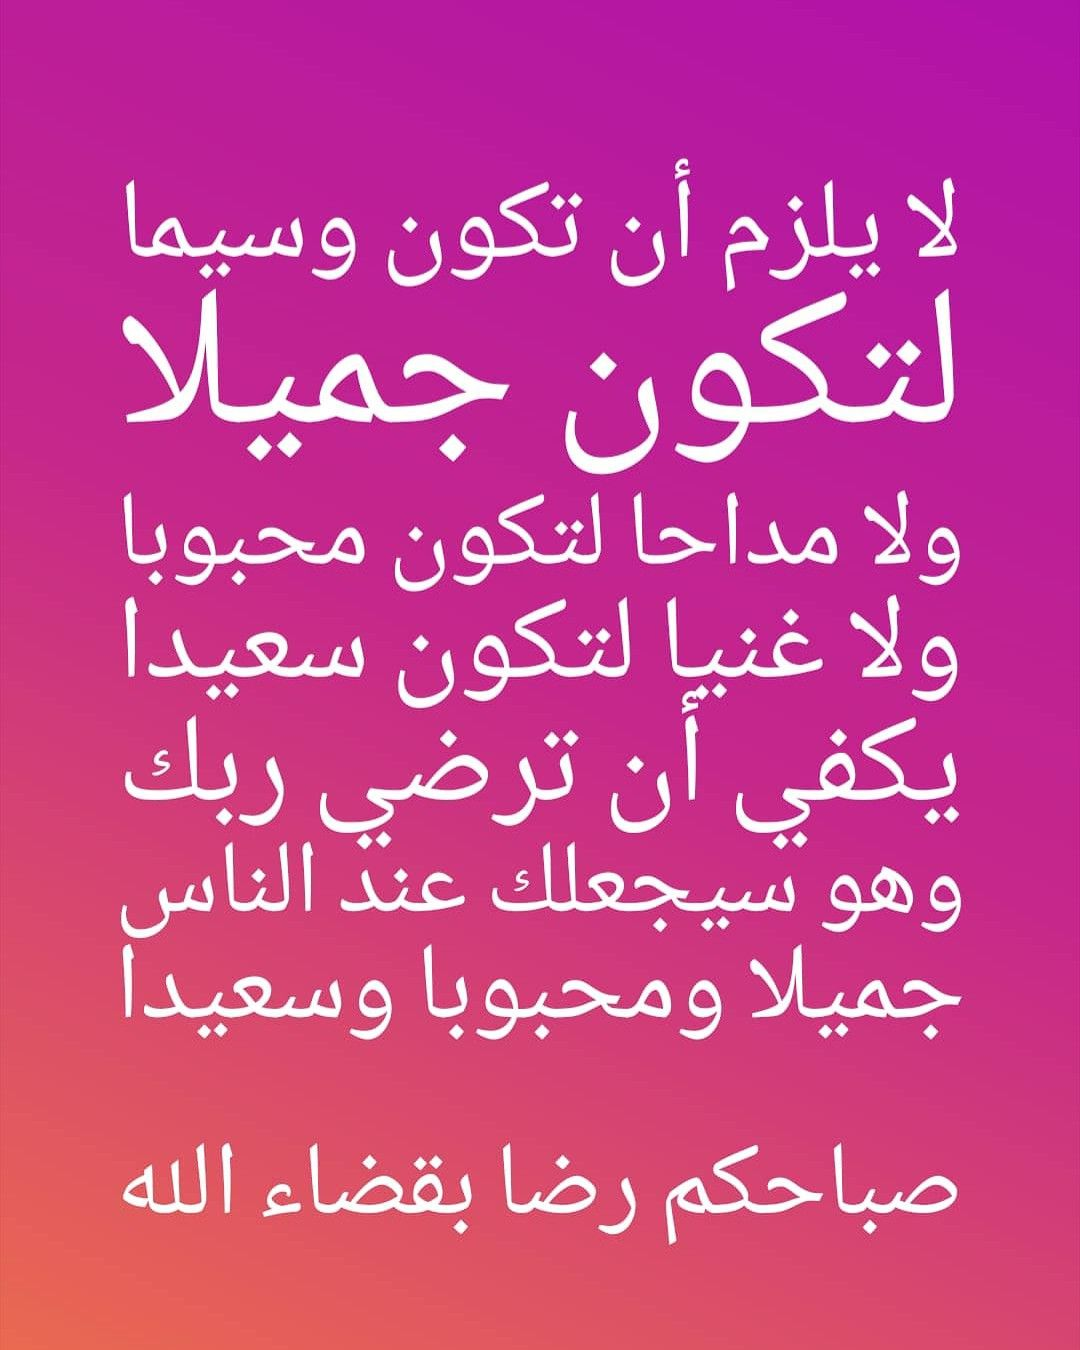 Pin By Wael Helmy On يلا نساعد بعض نتوب Calligraphy Arabic Calligraphy